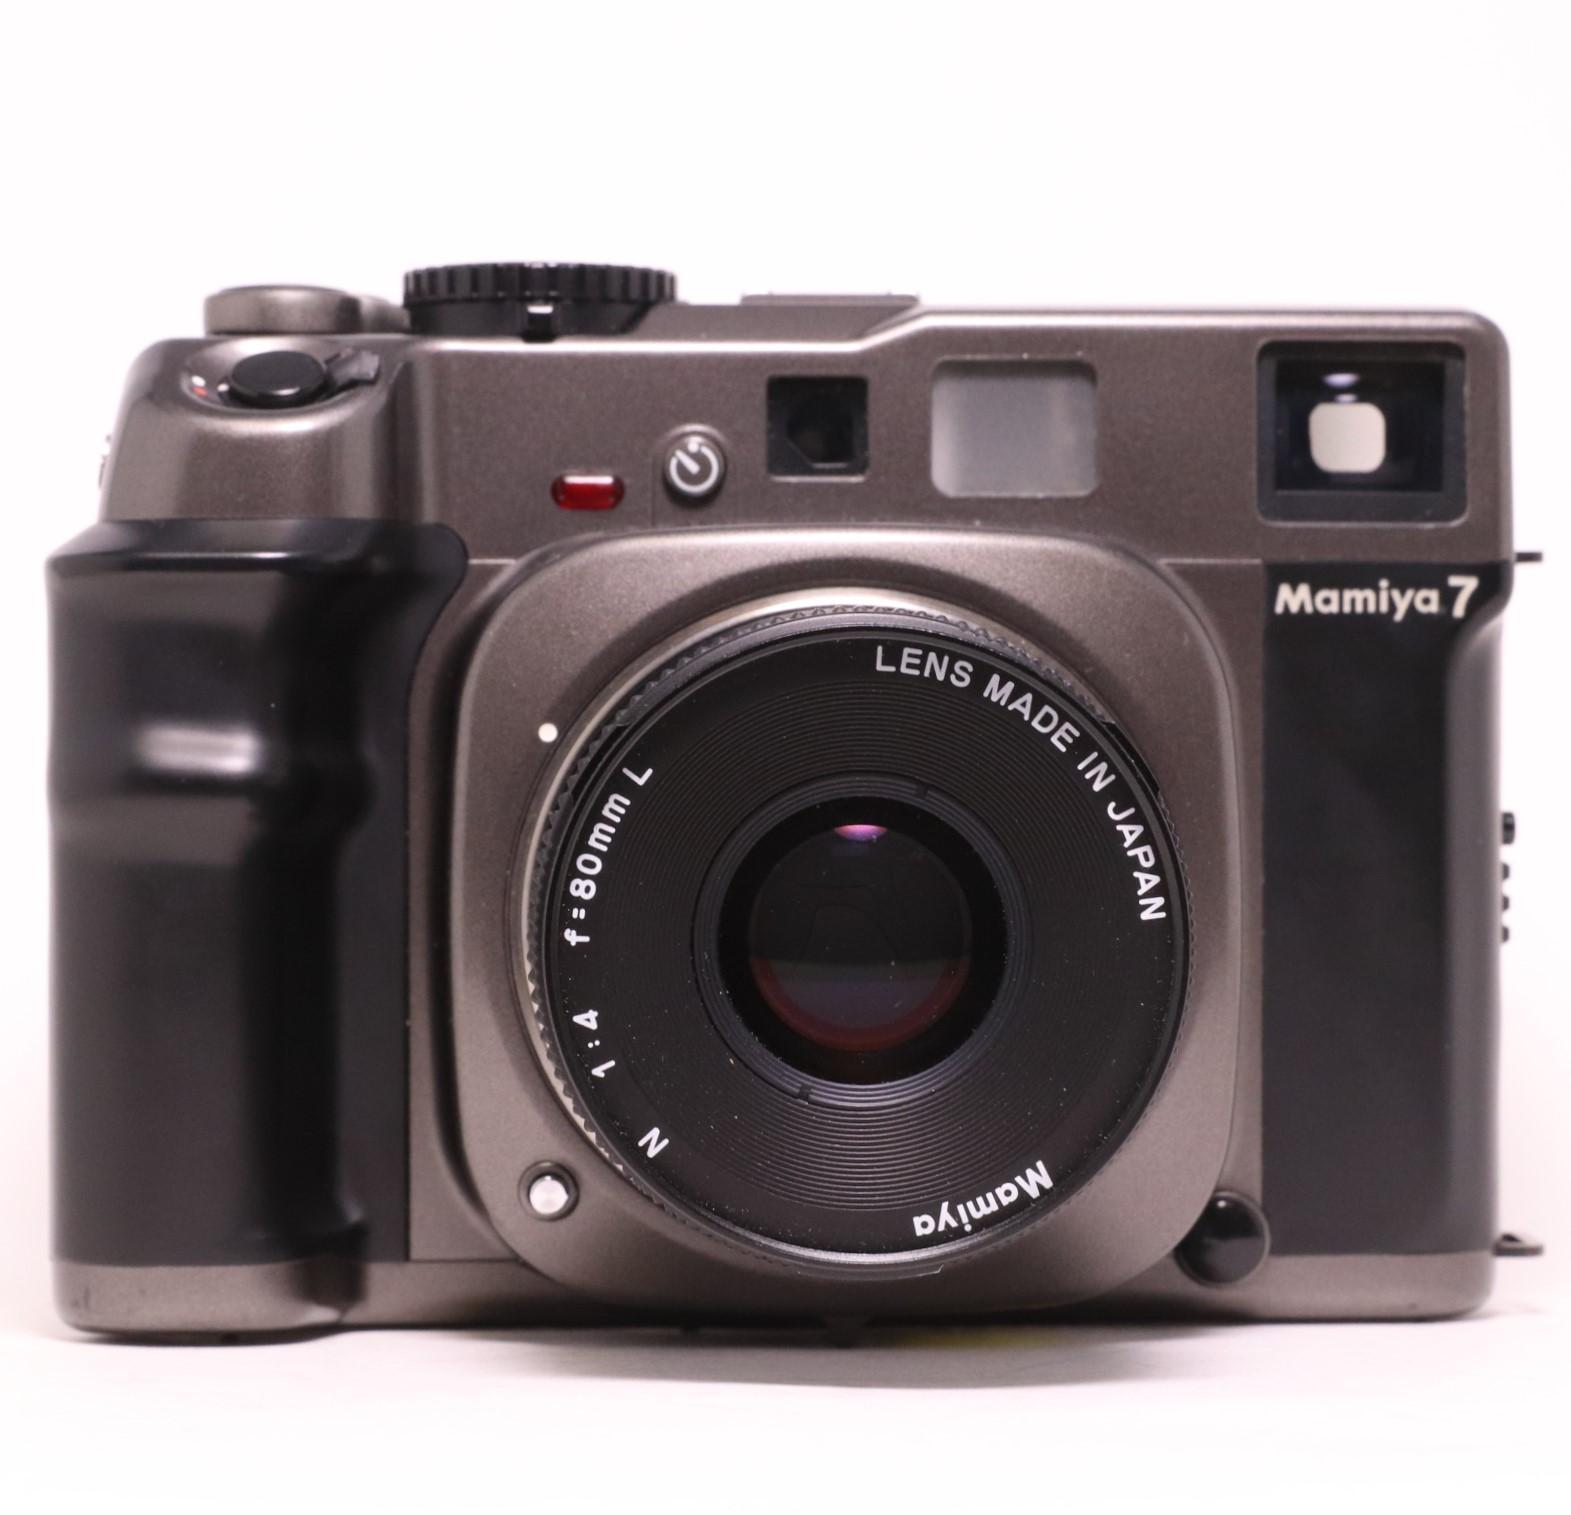 USED Mamiya 7 Medium Format Film Camera w/ N 80mm f4 L Lens